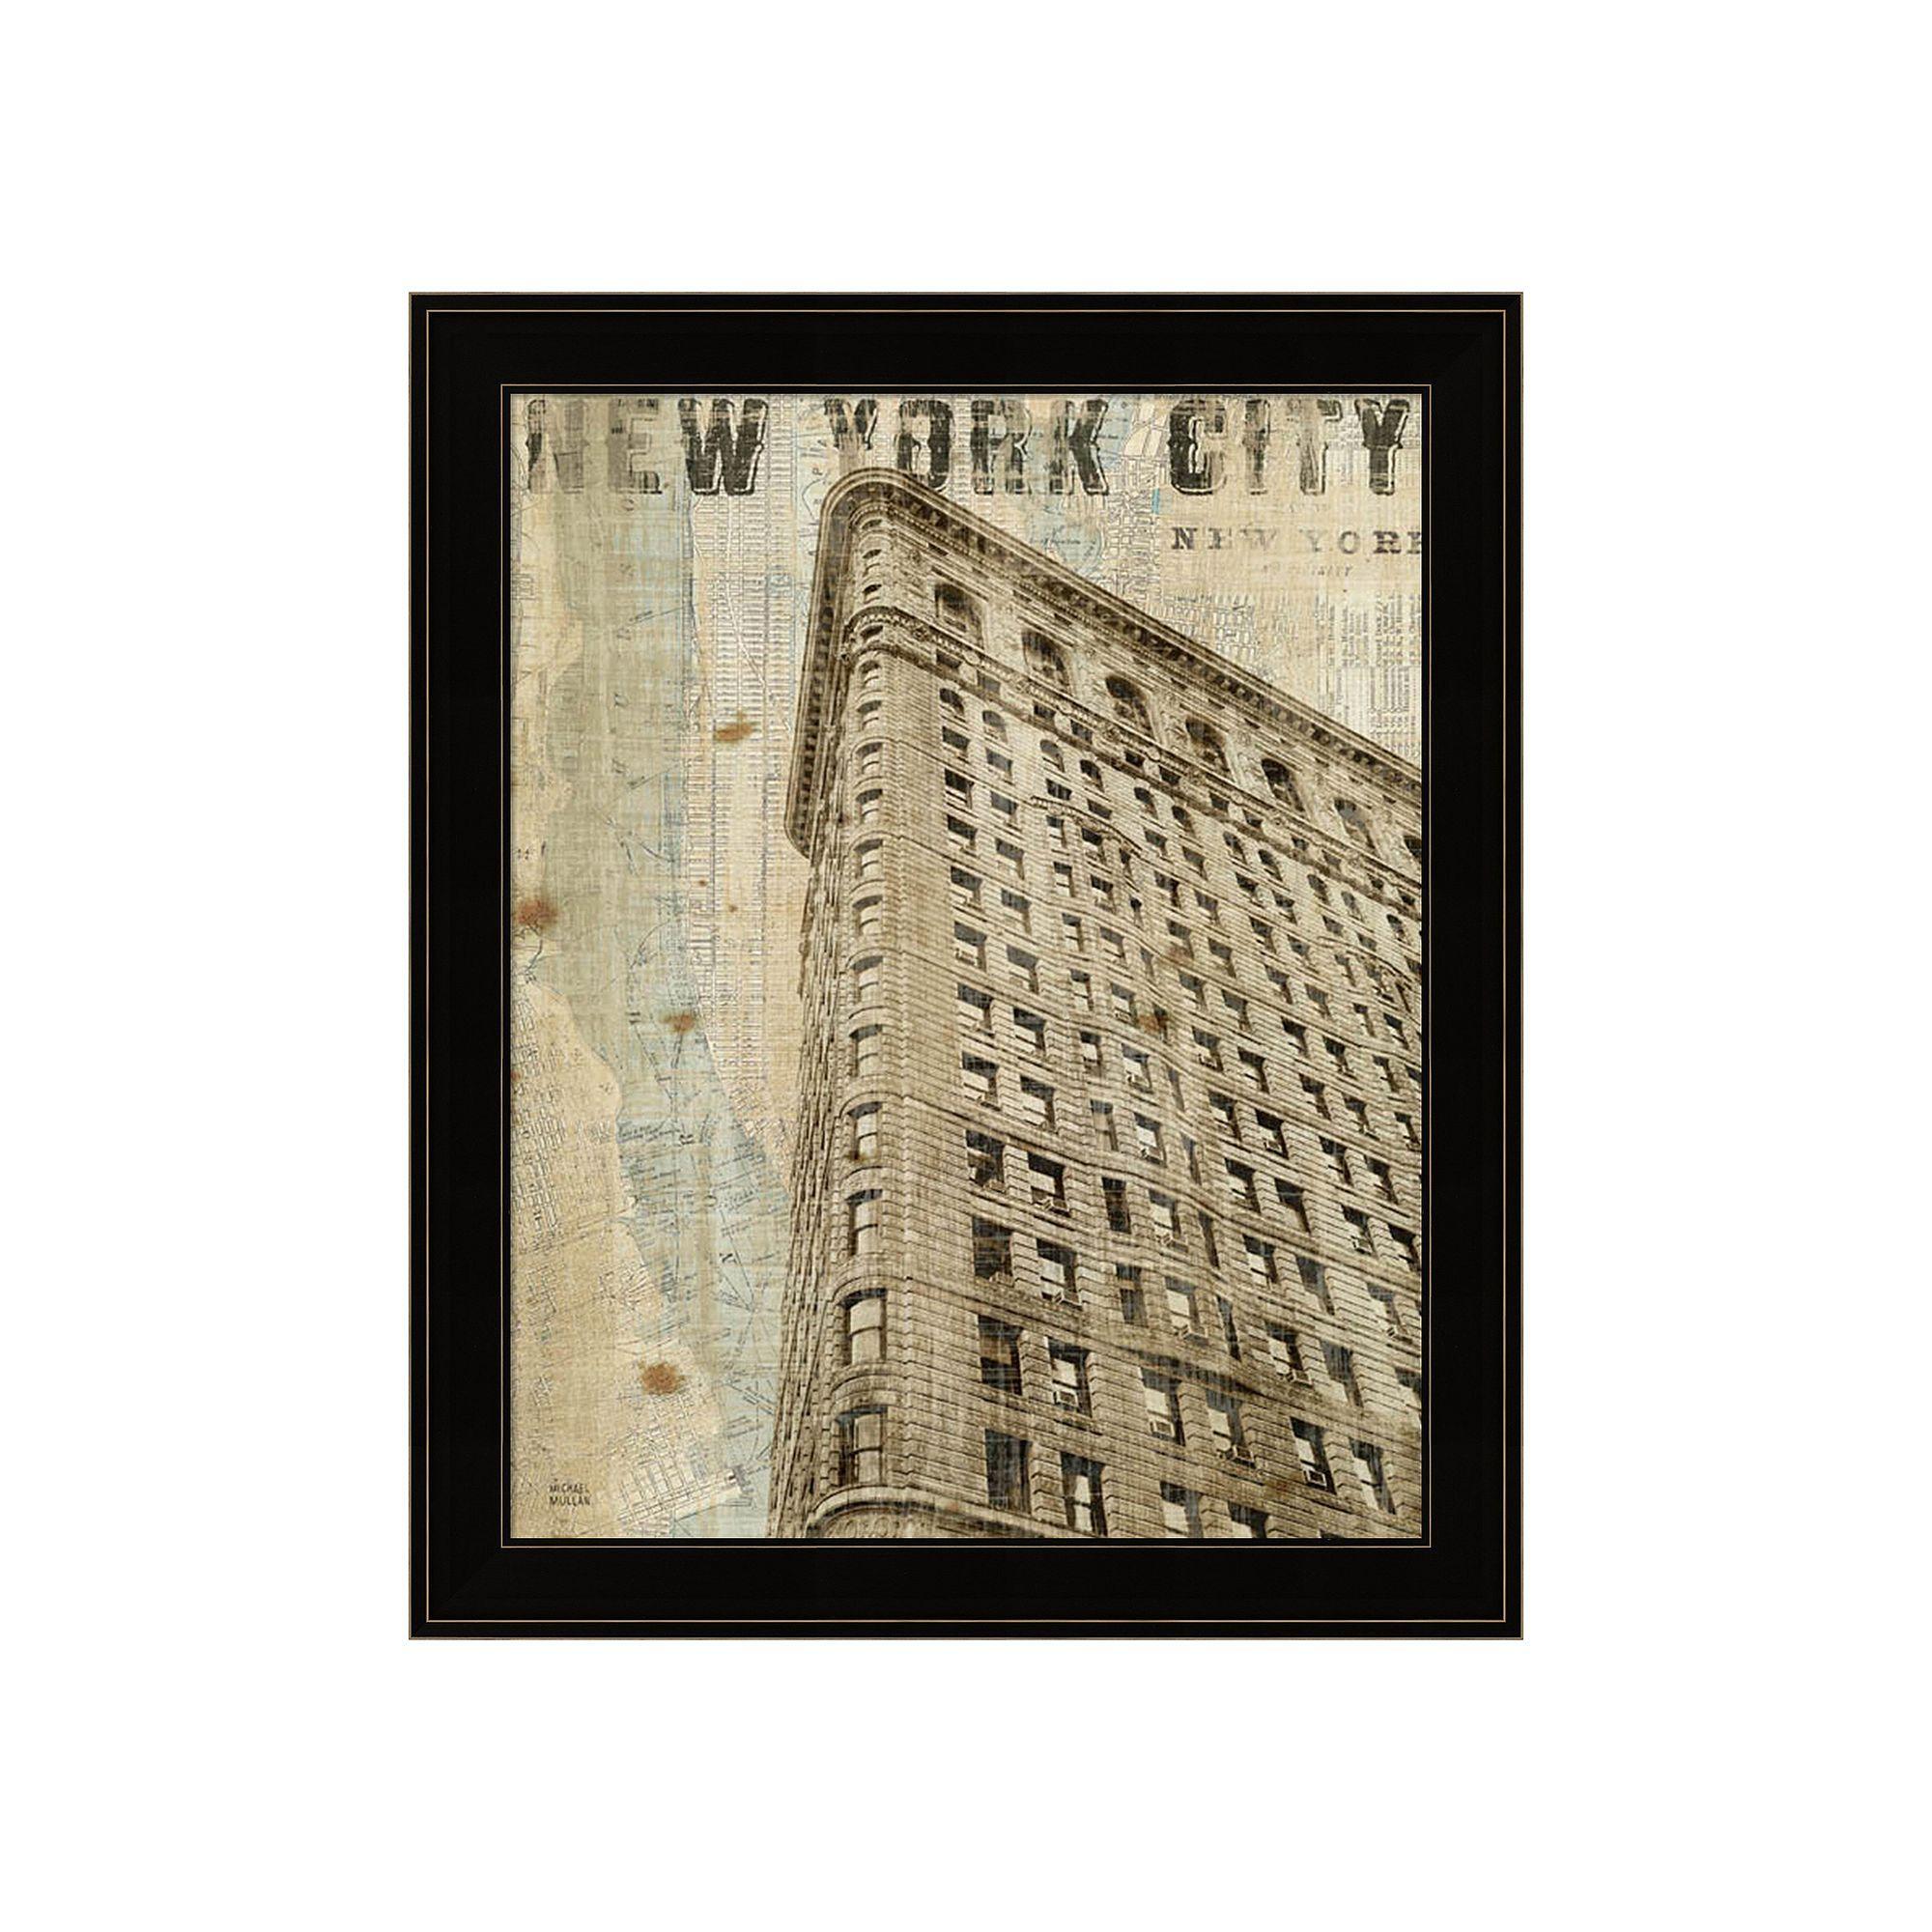 Vintage NY Flat Iron Framed Wall Art, Multicolor